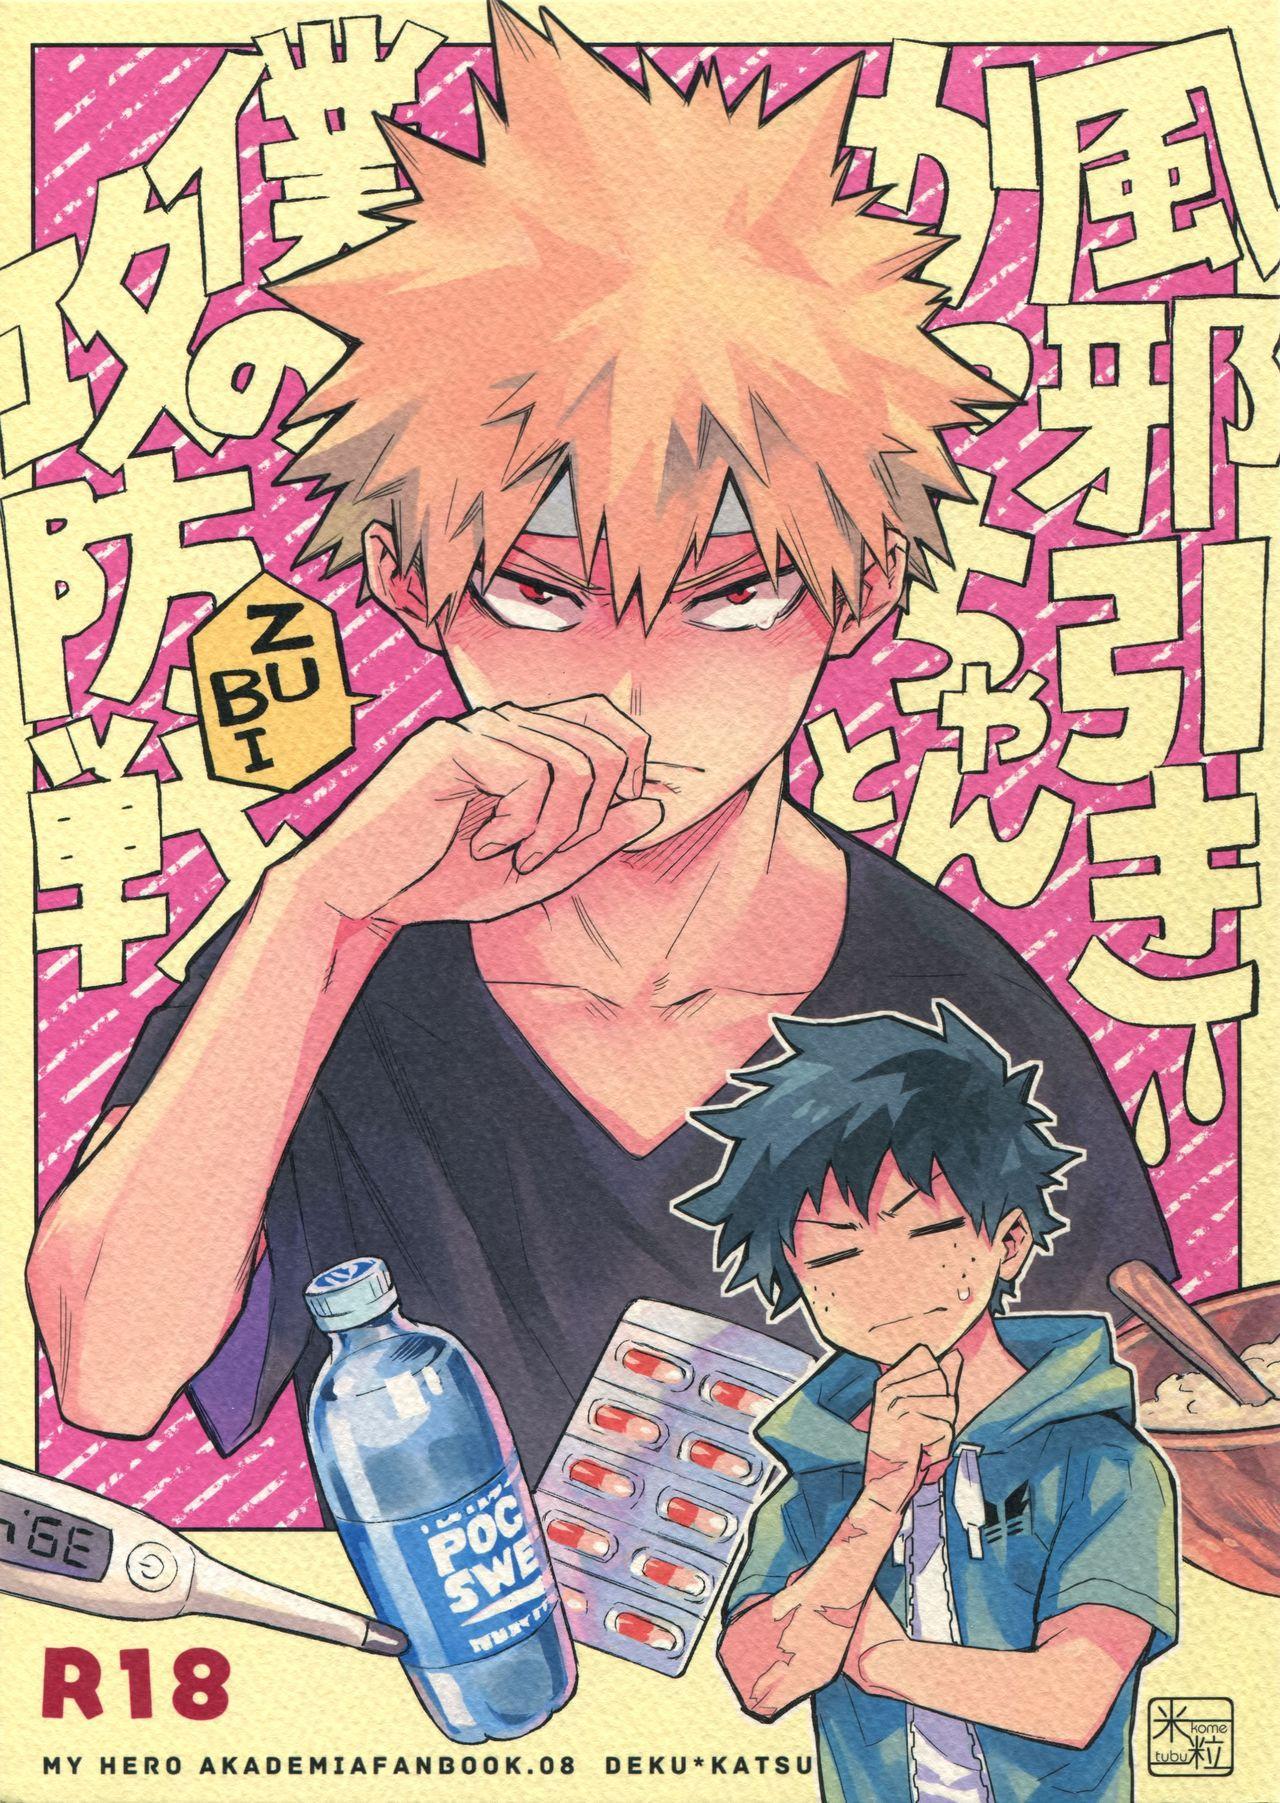 Kazehiki Kacchan to Boku no Koubousen | The Battle Between Sick Kacchan and Me 0